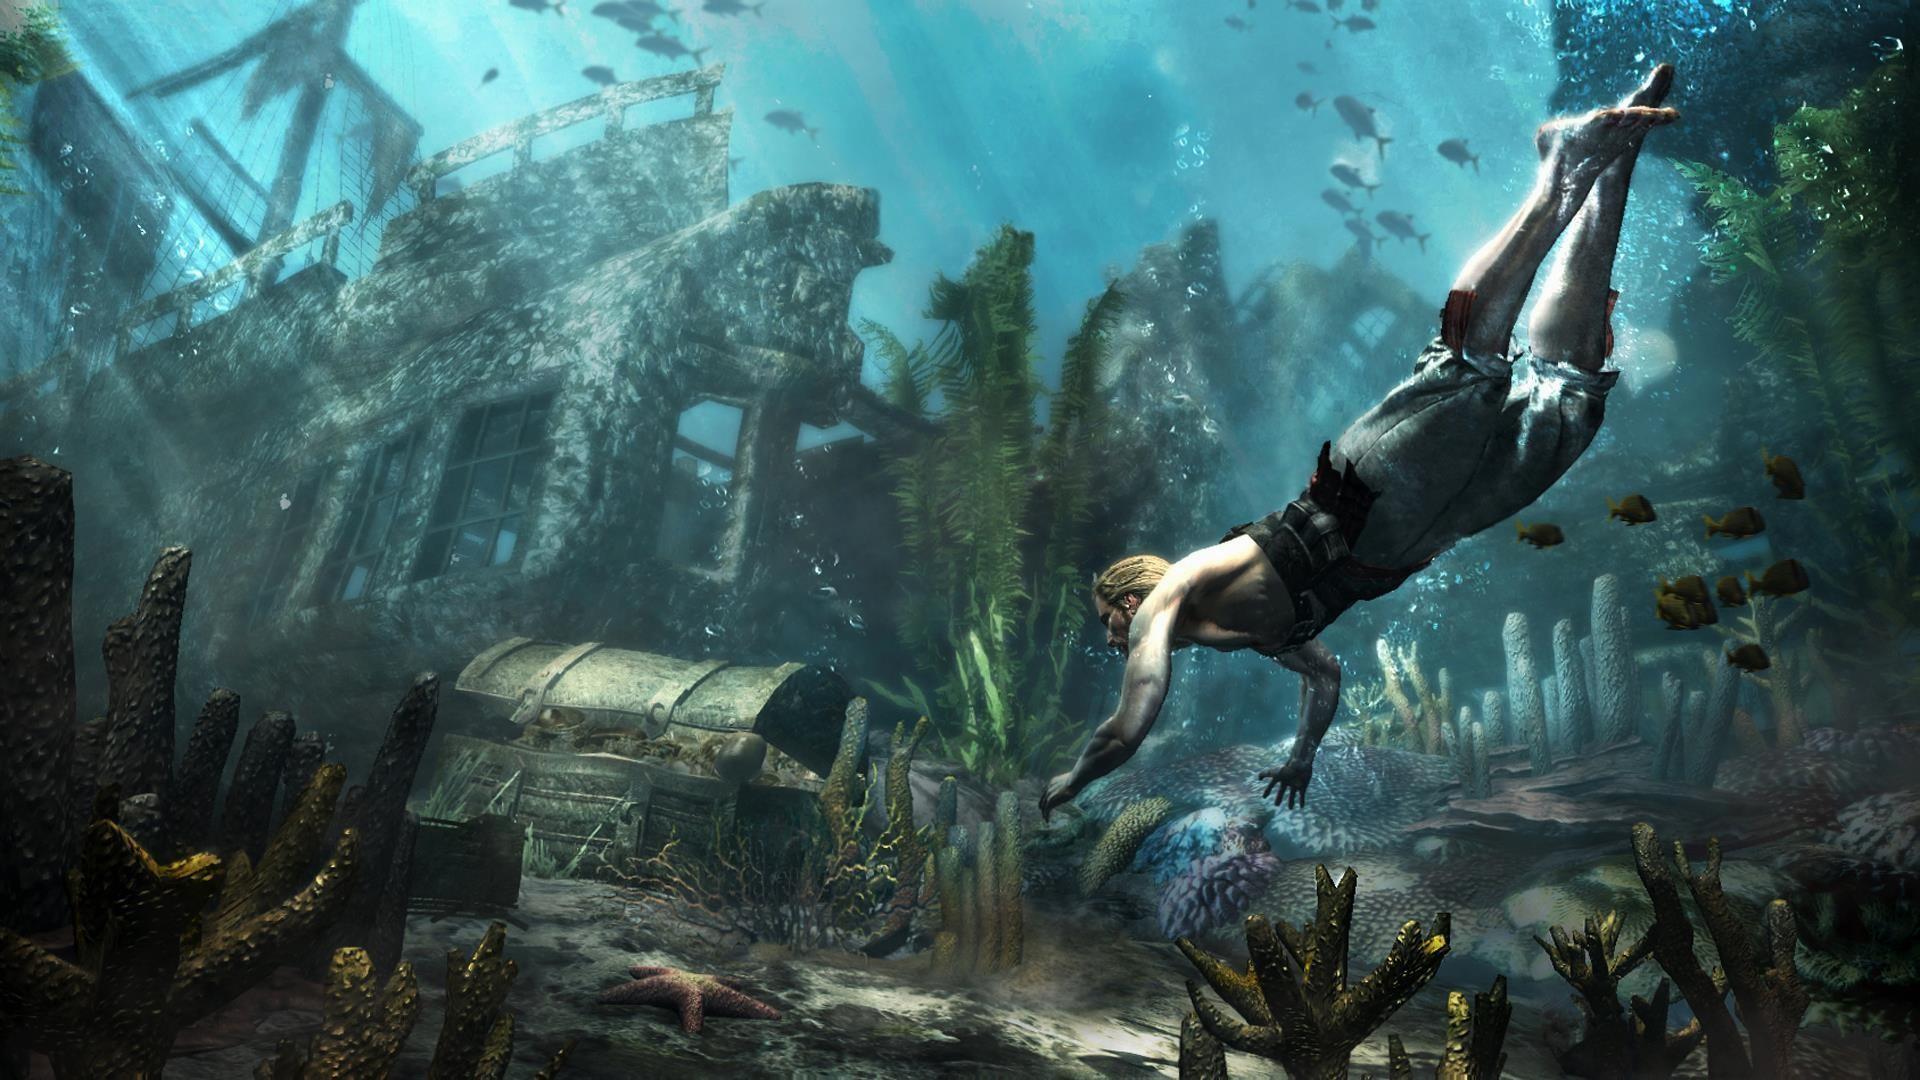 wallpaper.wiki-Assassins-Creed-Black-Flag-Background-Widescreen-